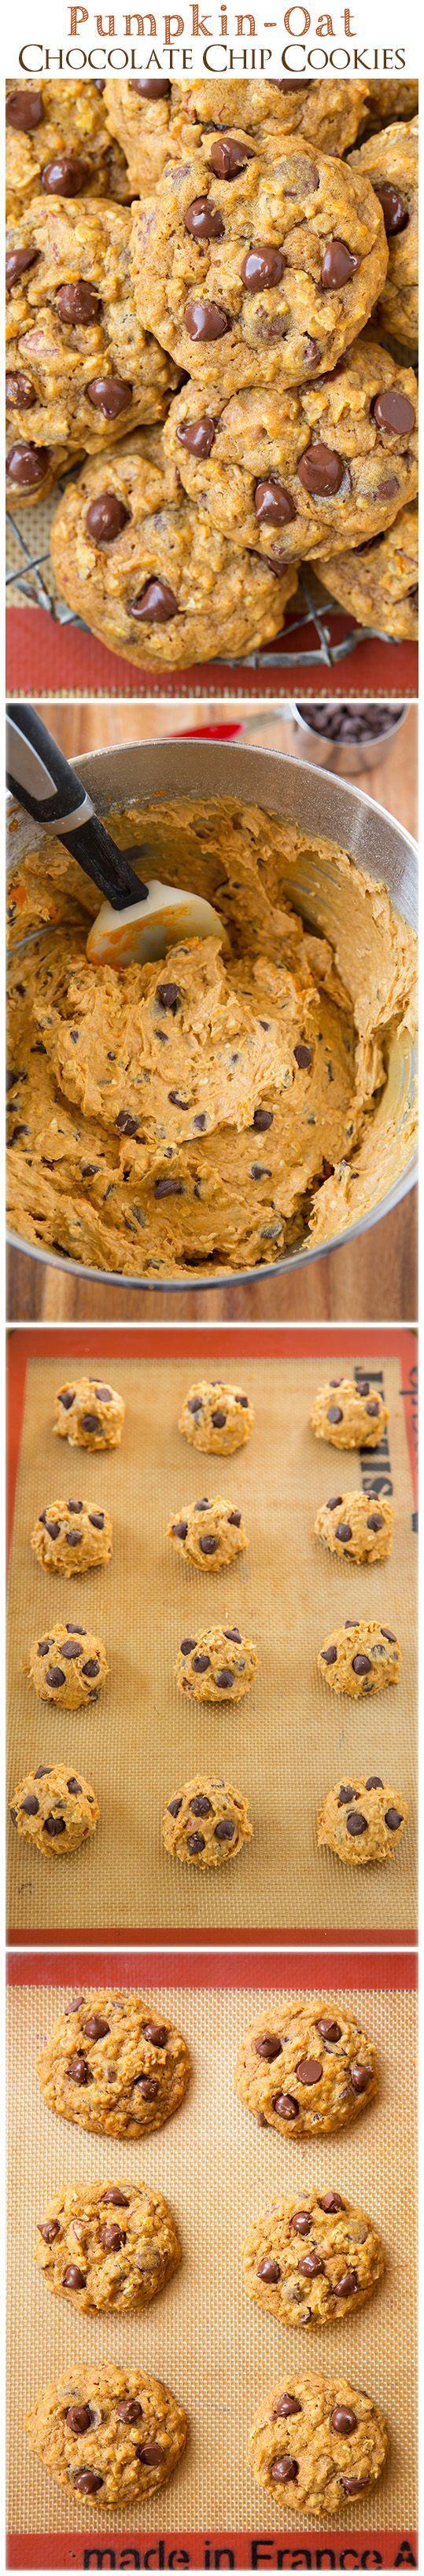 Pumpkin-Oat Chocolate Chip Cookies